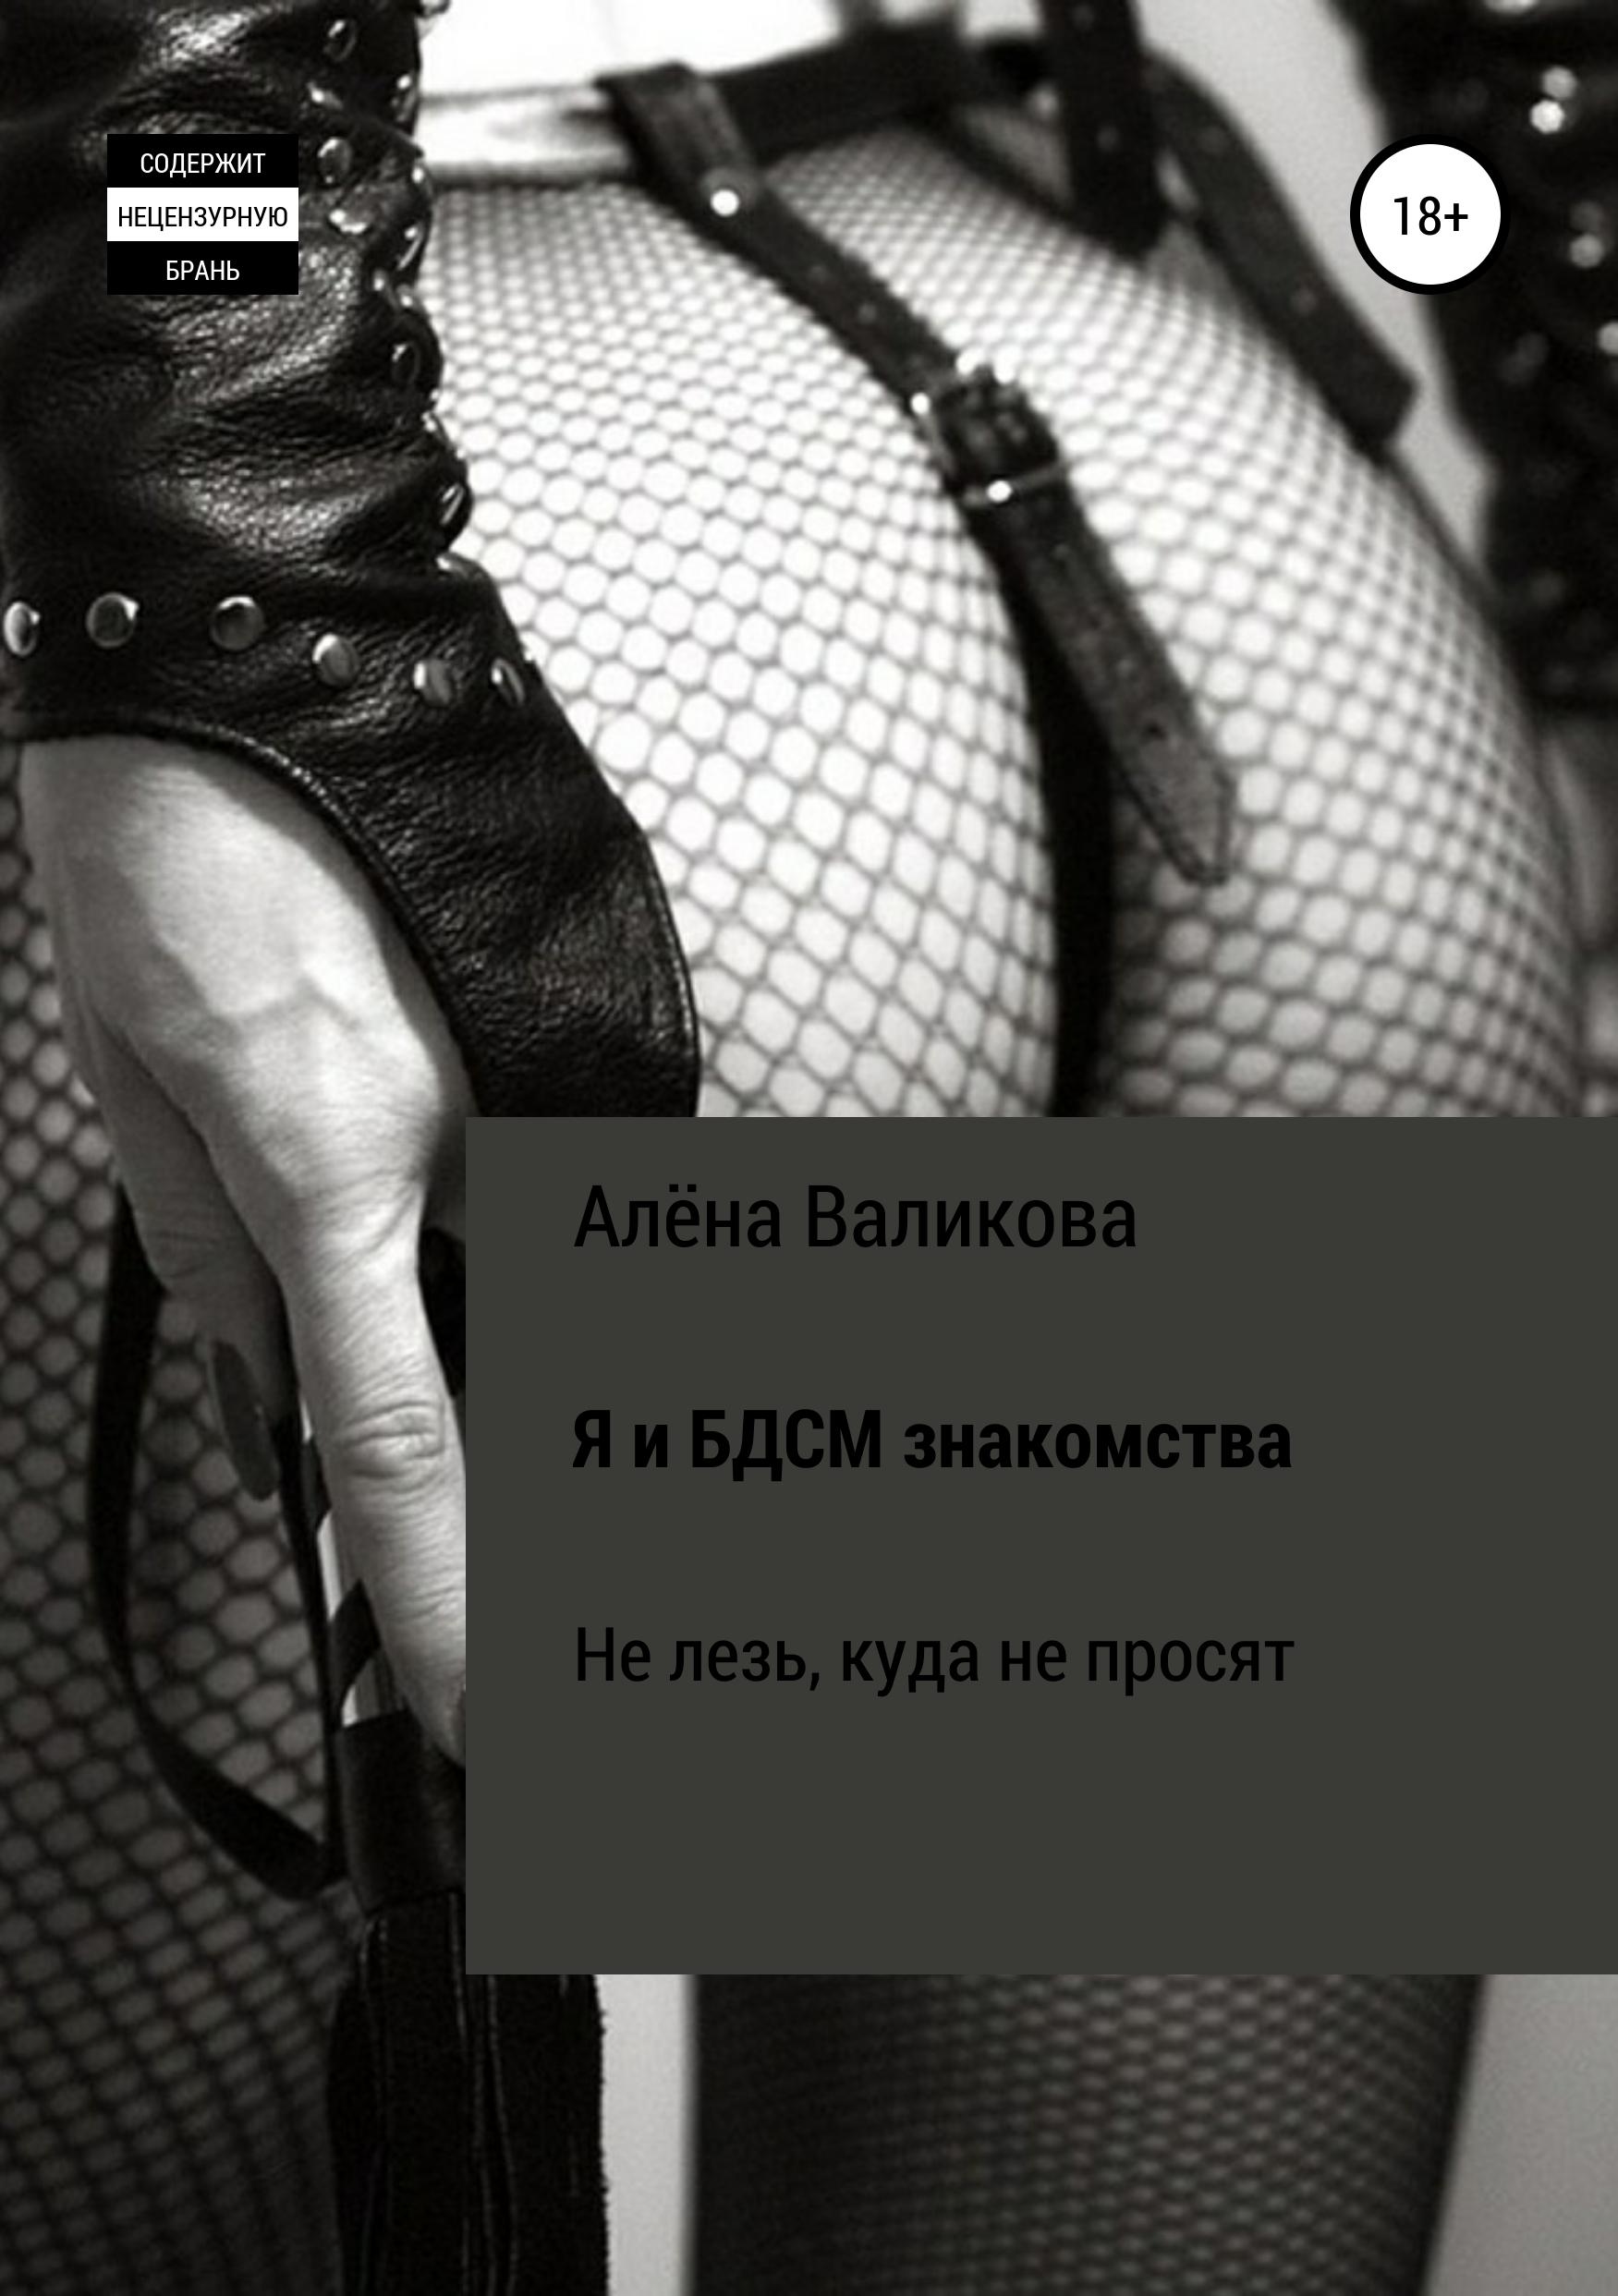 Алёна Сергеевна Валикова Я и BDSM знакомства. Не лезь, куда не просят